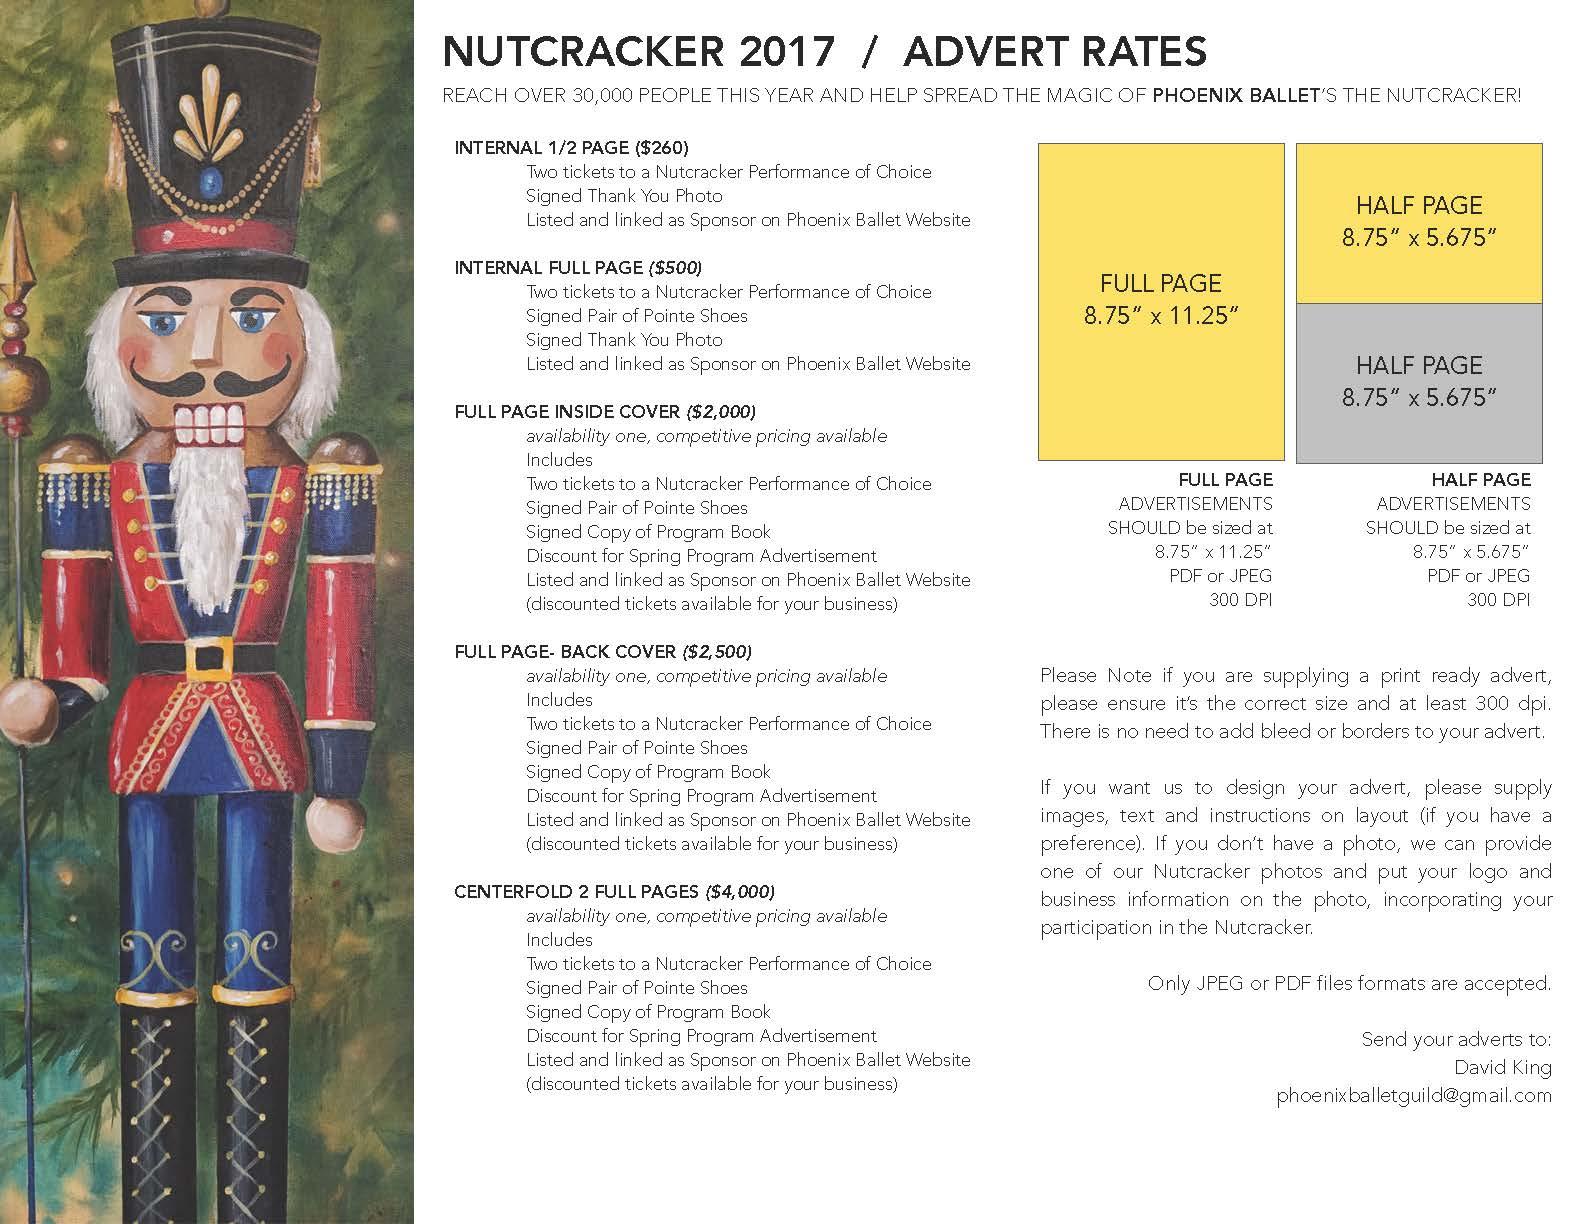 NUTCRACKER AD RATES.jpg